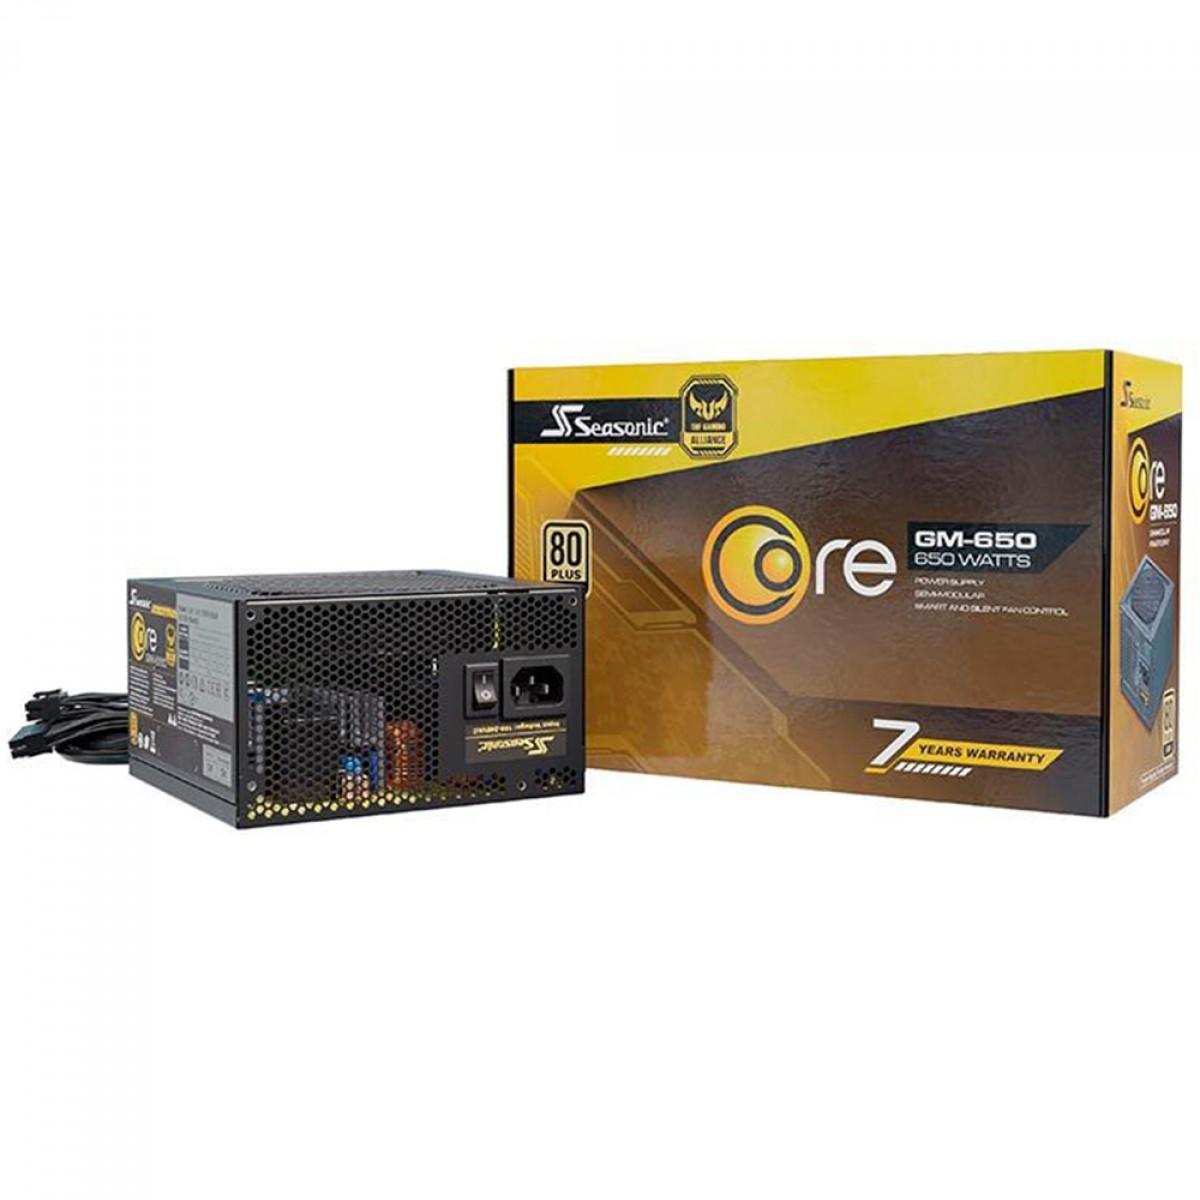 Fonte Seasonic Core GM-650, 650W, 80 Plus Gold, Semi Modular